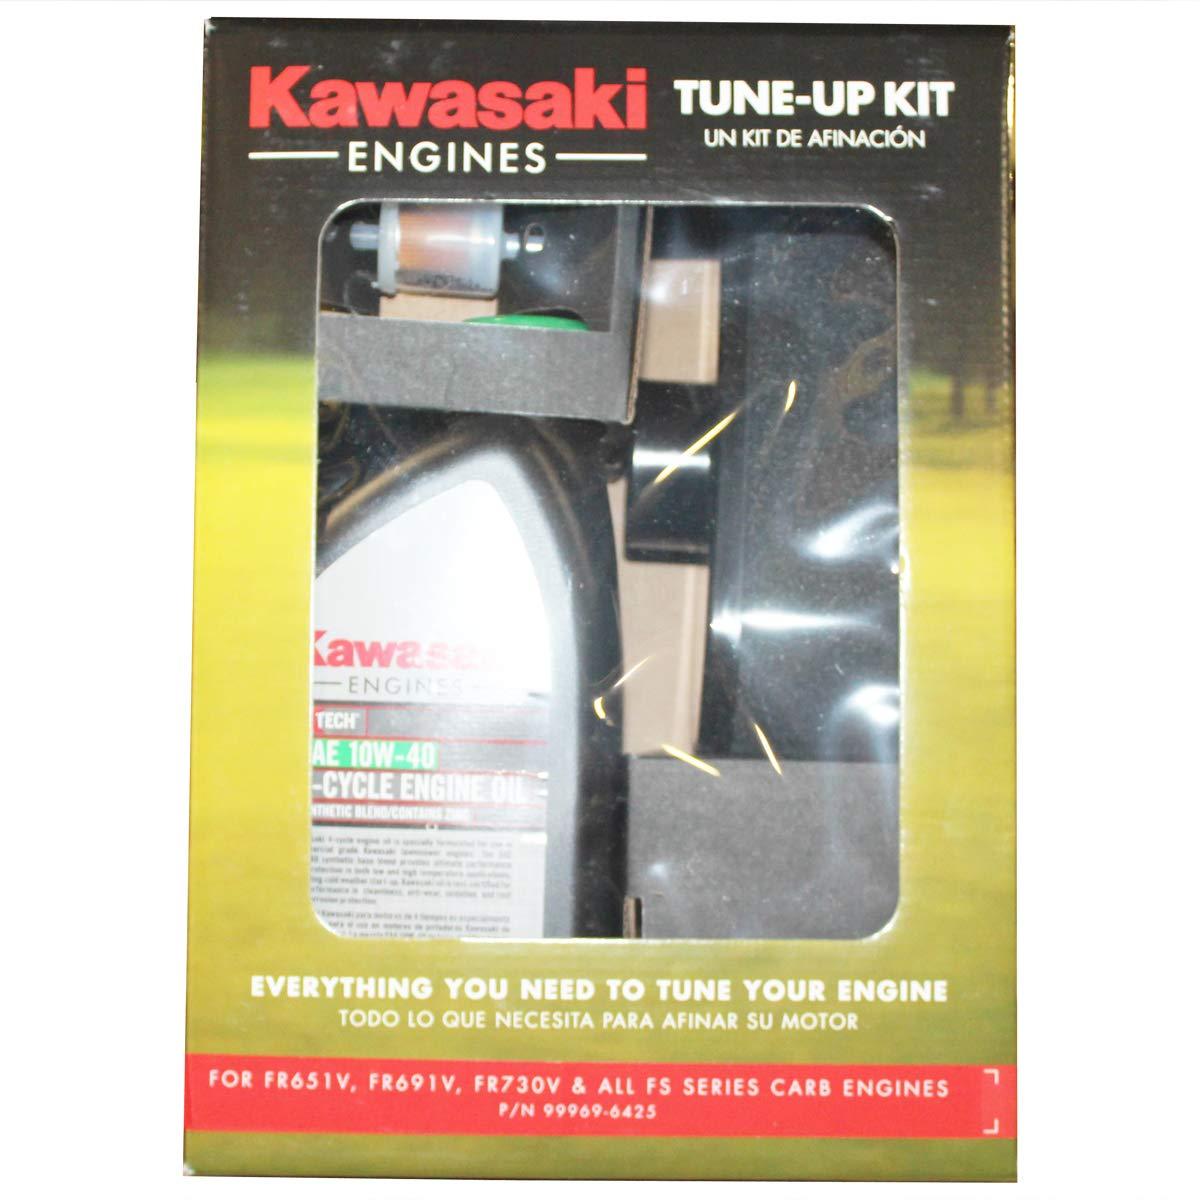 Top 9 kawasaki lawn mower engine parts 2019 - Home Appliances Kawasaki Fs V Engine Lawn Mower Wiring Diagram on